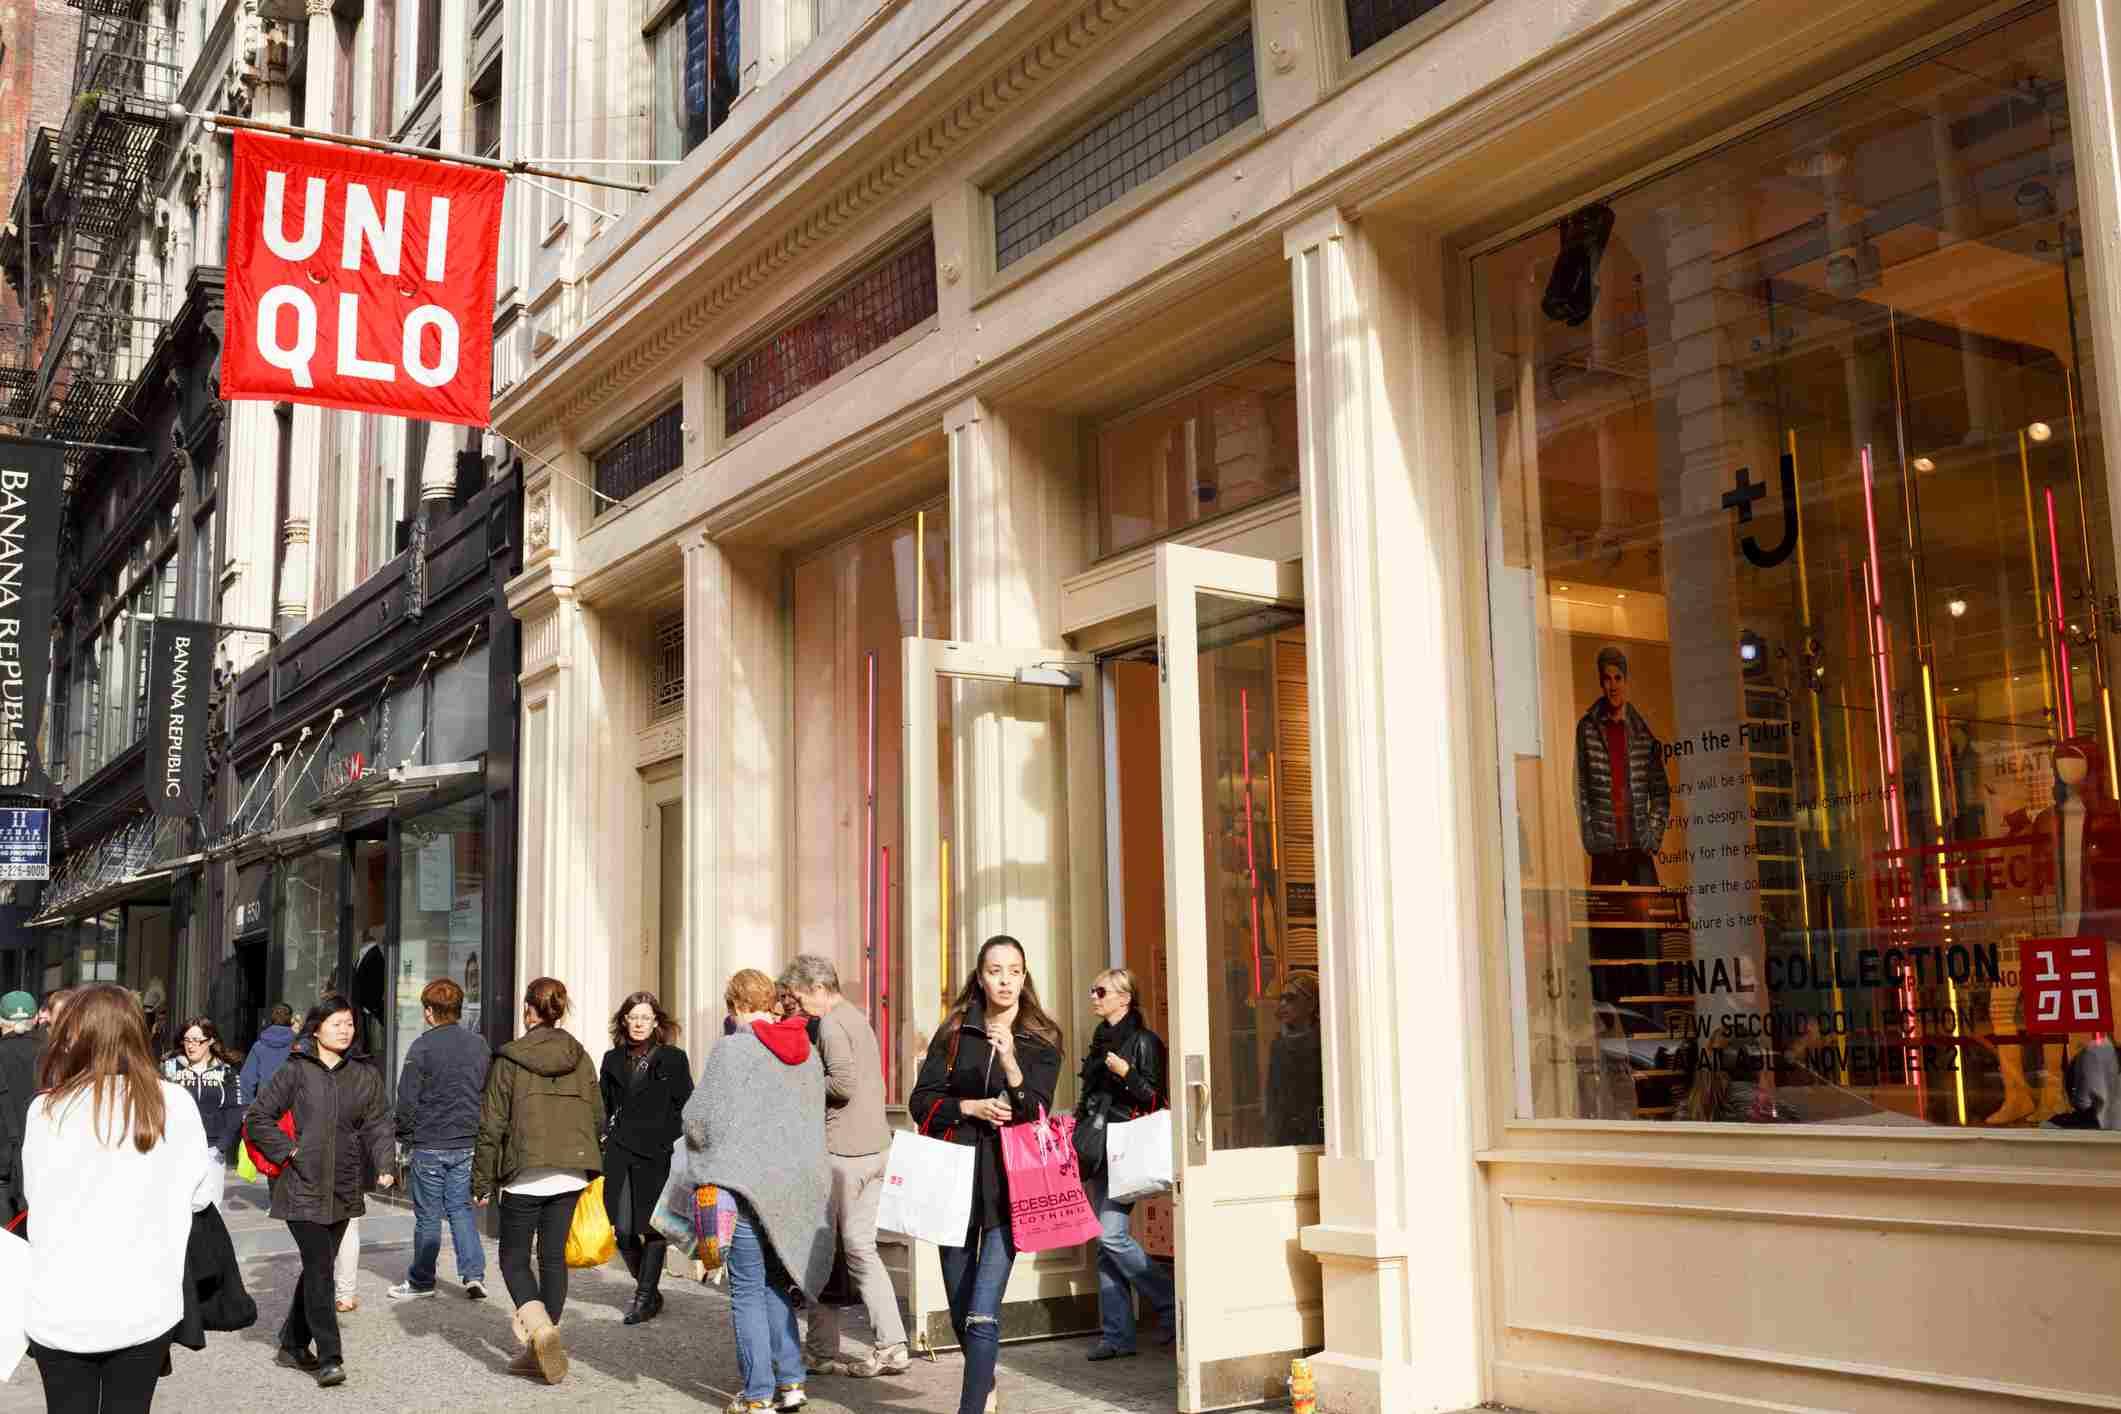 Uniqlo Store SoHo Manhattan